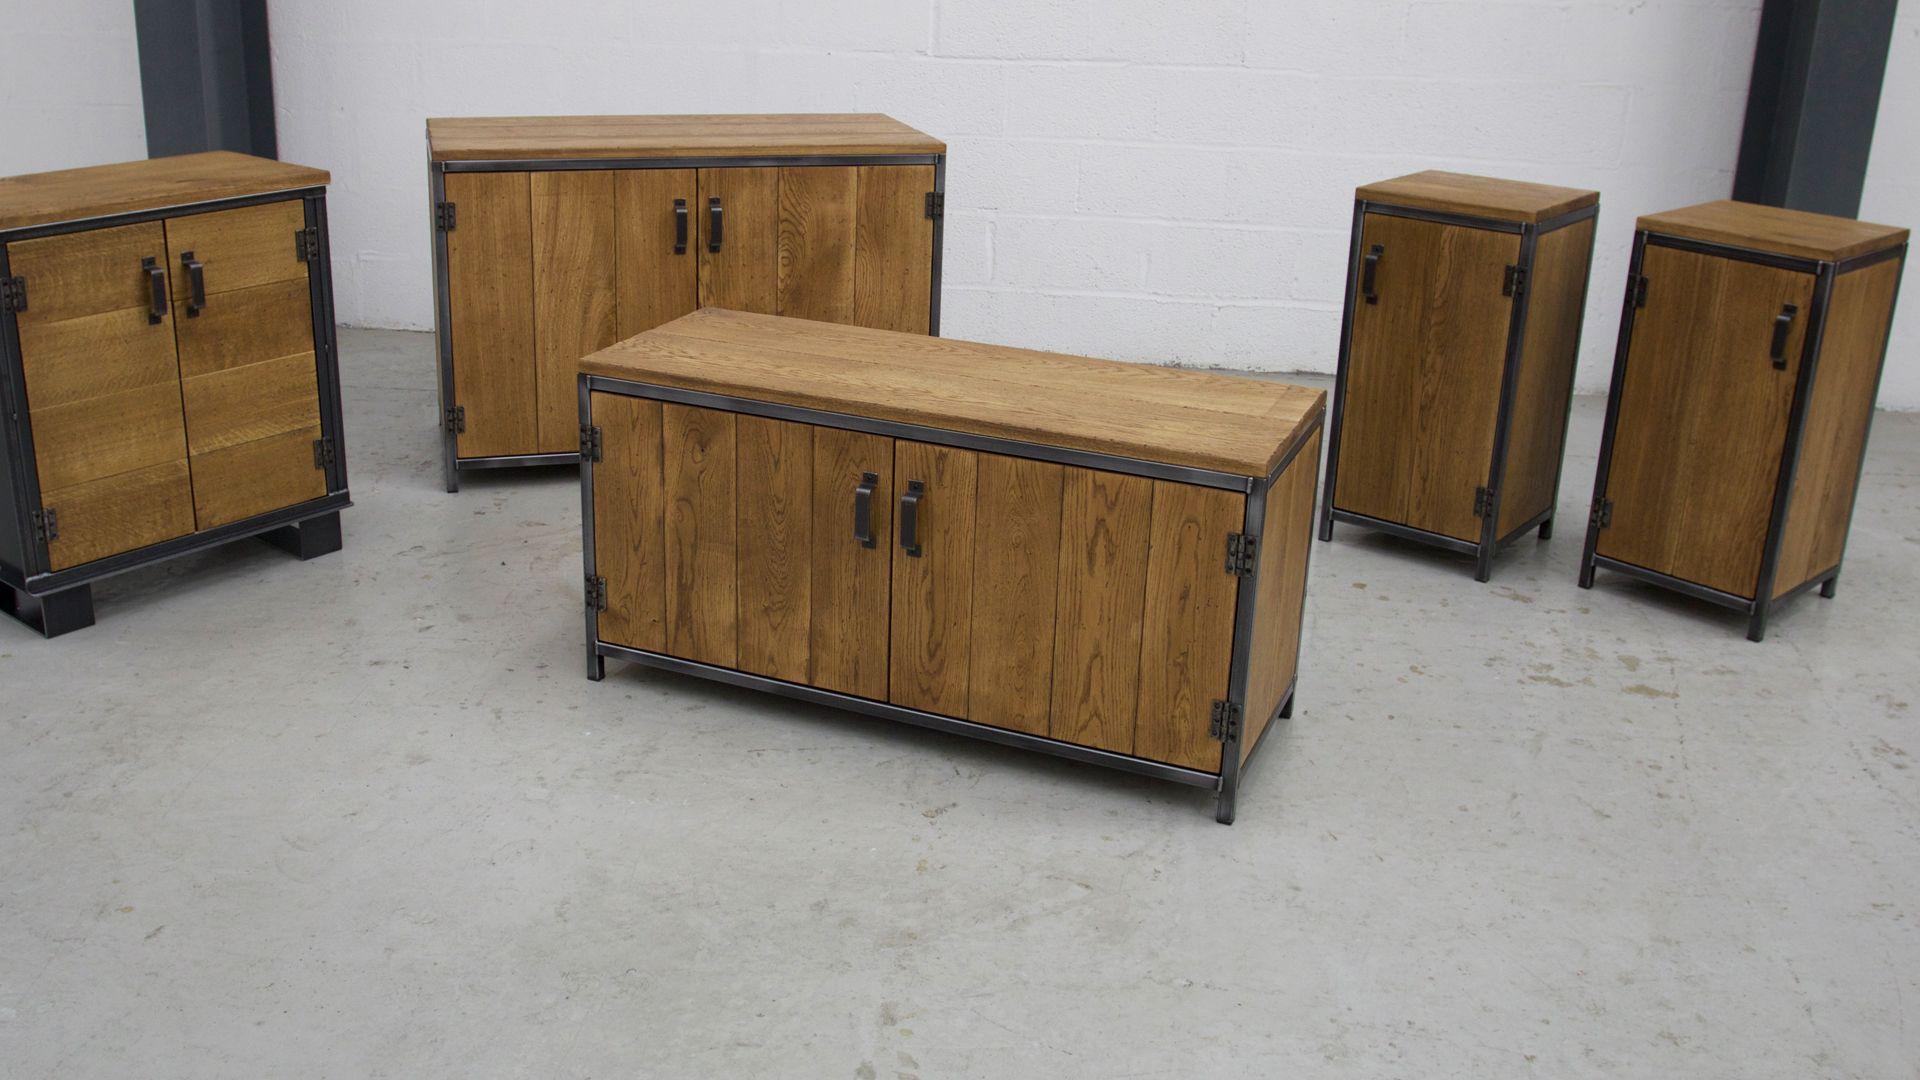 Credenza Industrial Fai Da Te : The workshop cupboard steel vintage industrial furniture